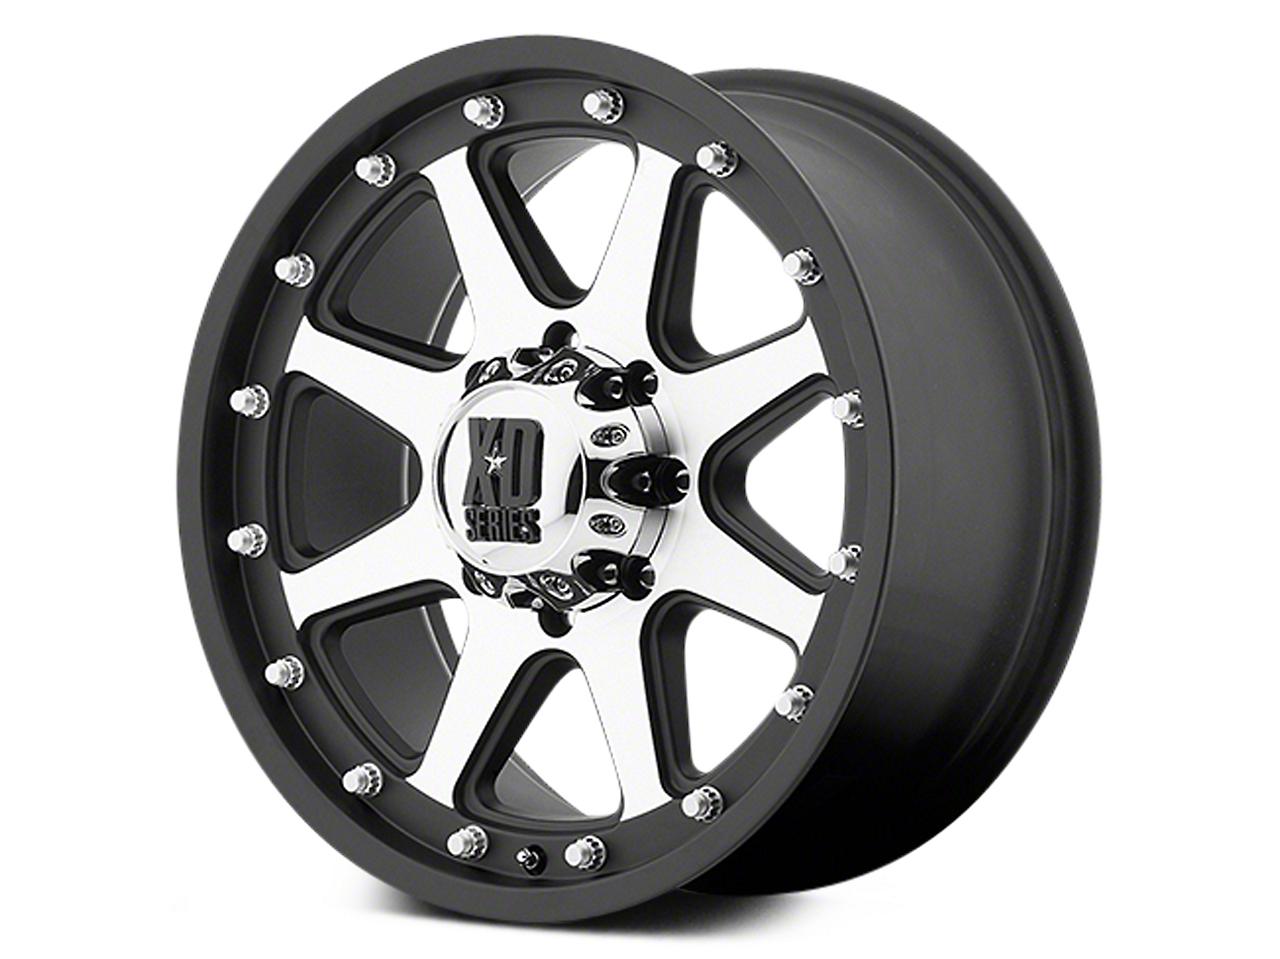 XD Addict Matte Black Machined 6-Lug Wheel - 17x9 (07-18 Sierra 1500)